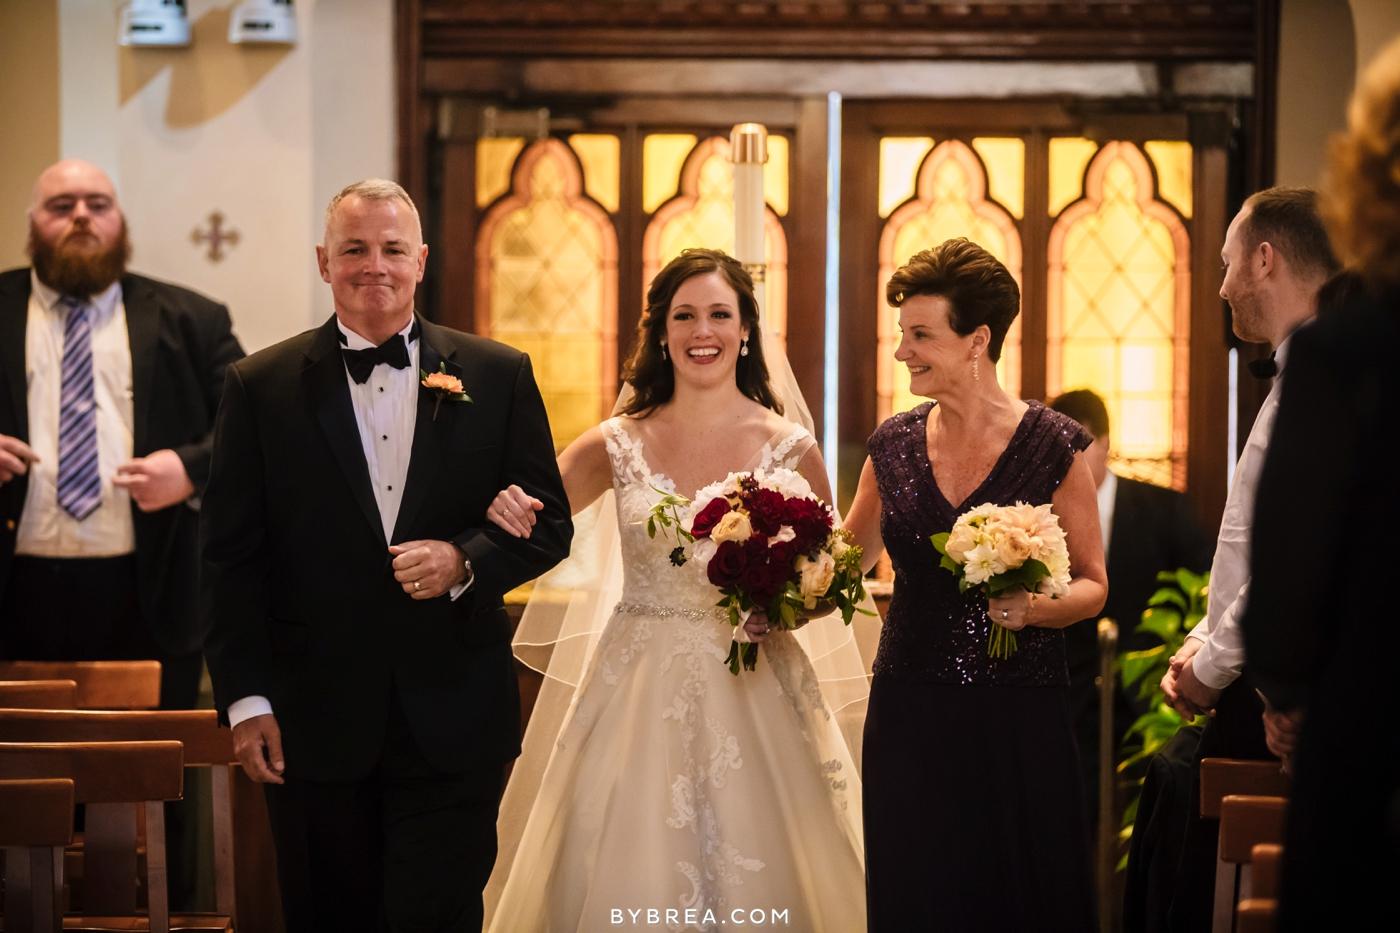 Georgetown Dahlgren Chapel bride walked down aisle